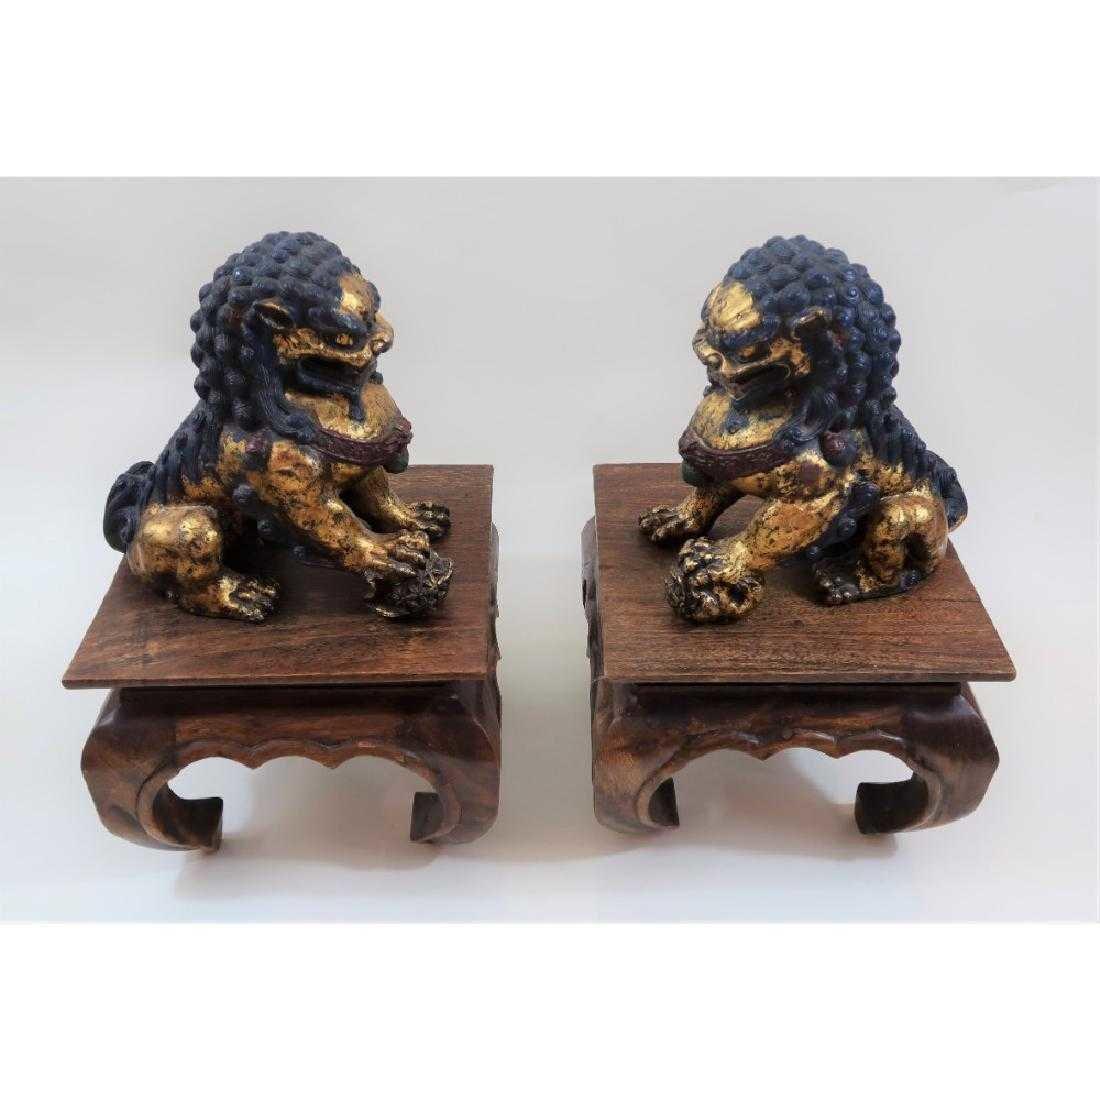 Pair of iron foo dogs 1800s - 2